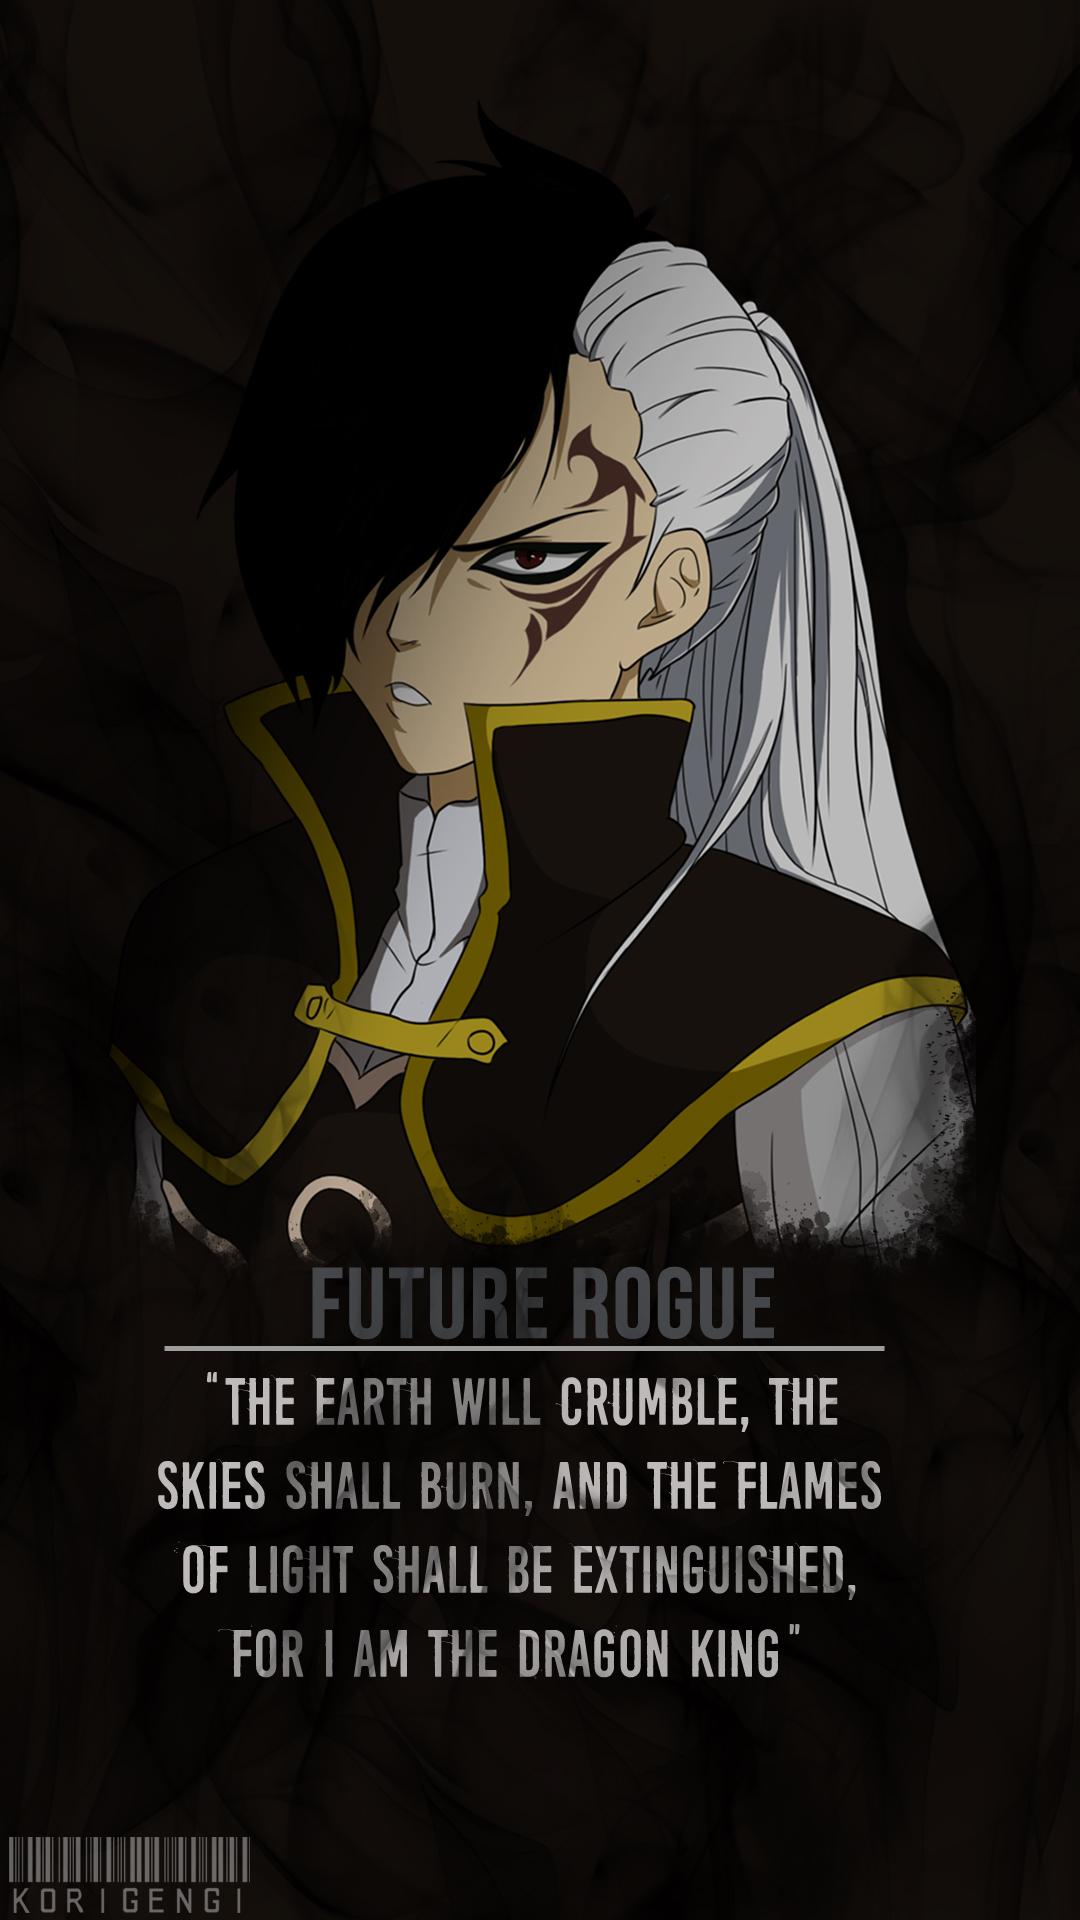 FUTURE ROGUE -KRGNG.jpg